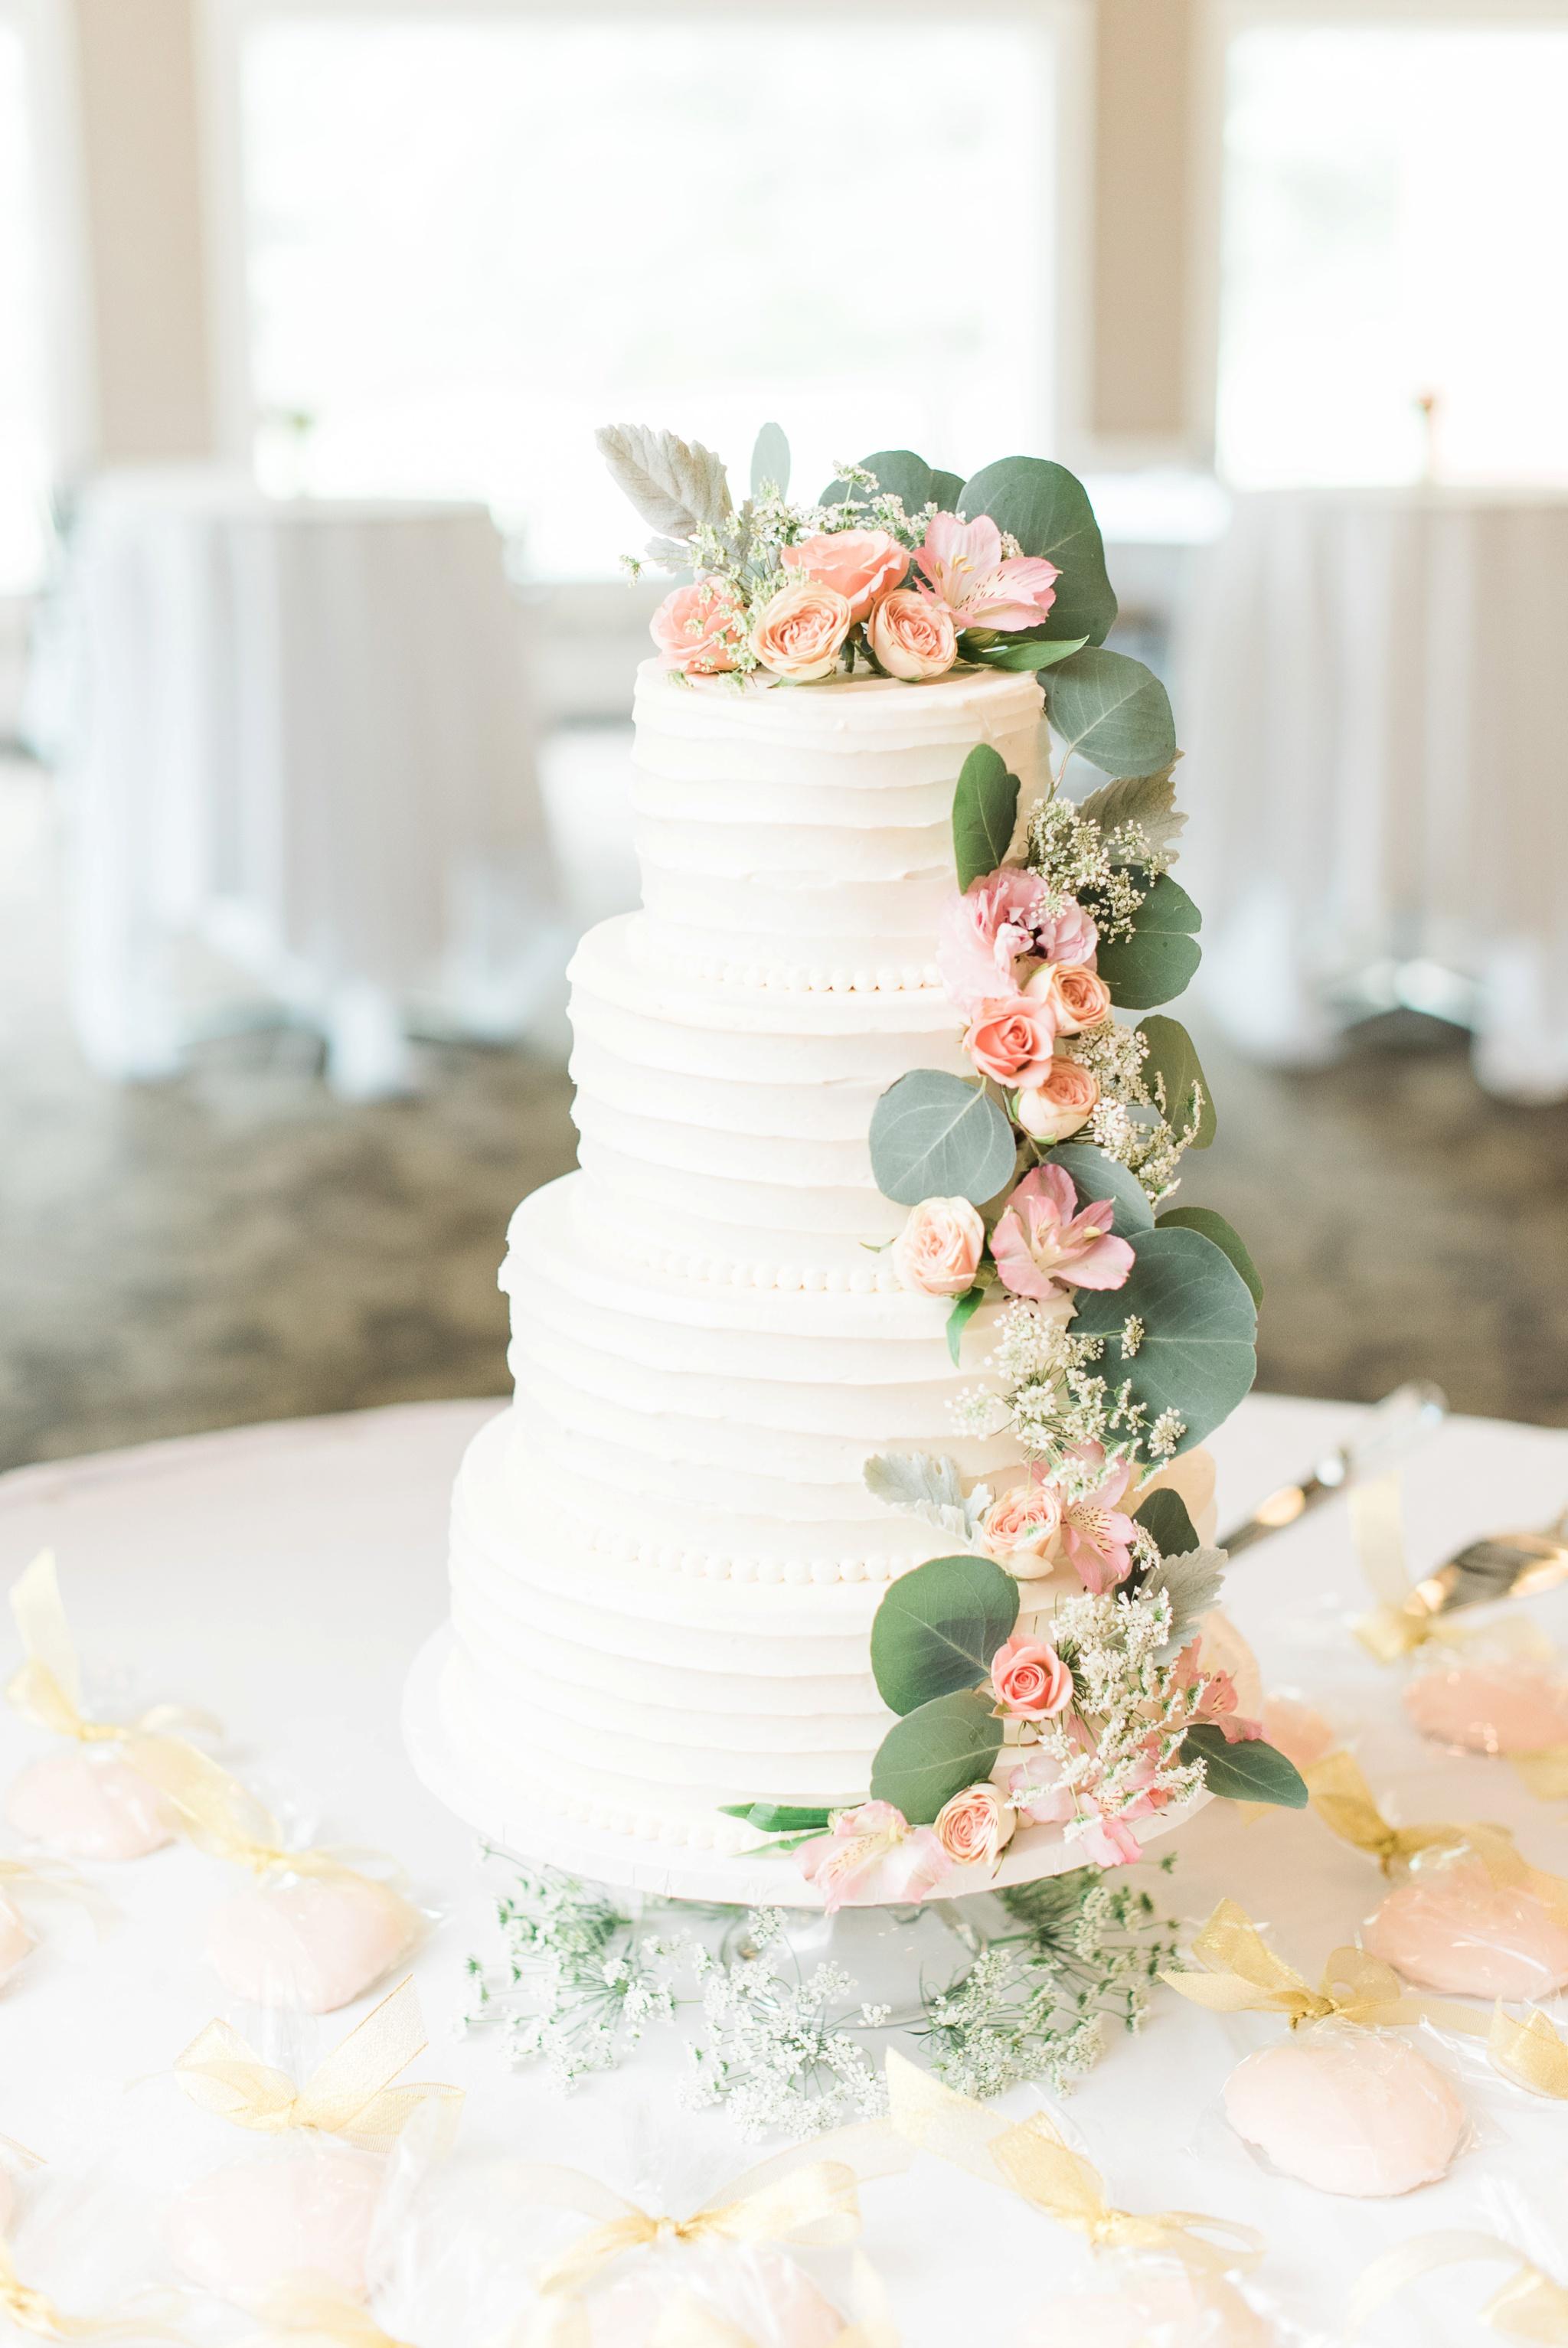 worthington-hills-country-club-wedding-columbus-ohio-meg-evan_0045.jpg